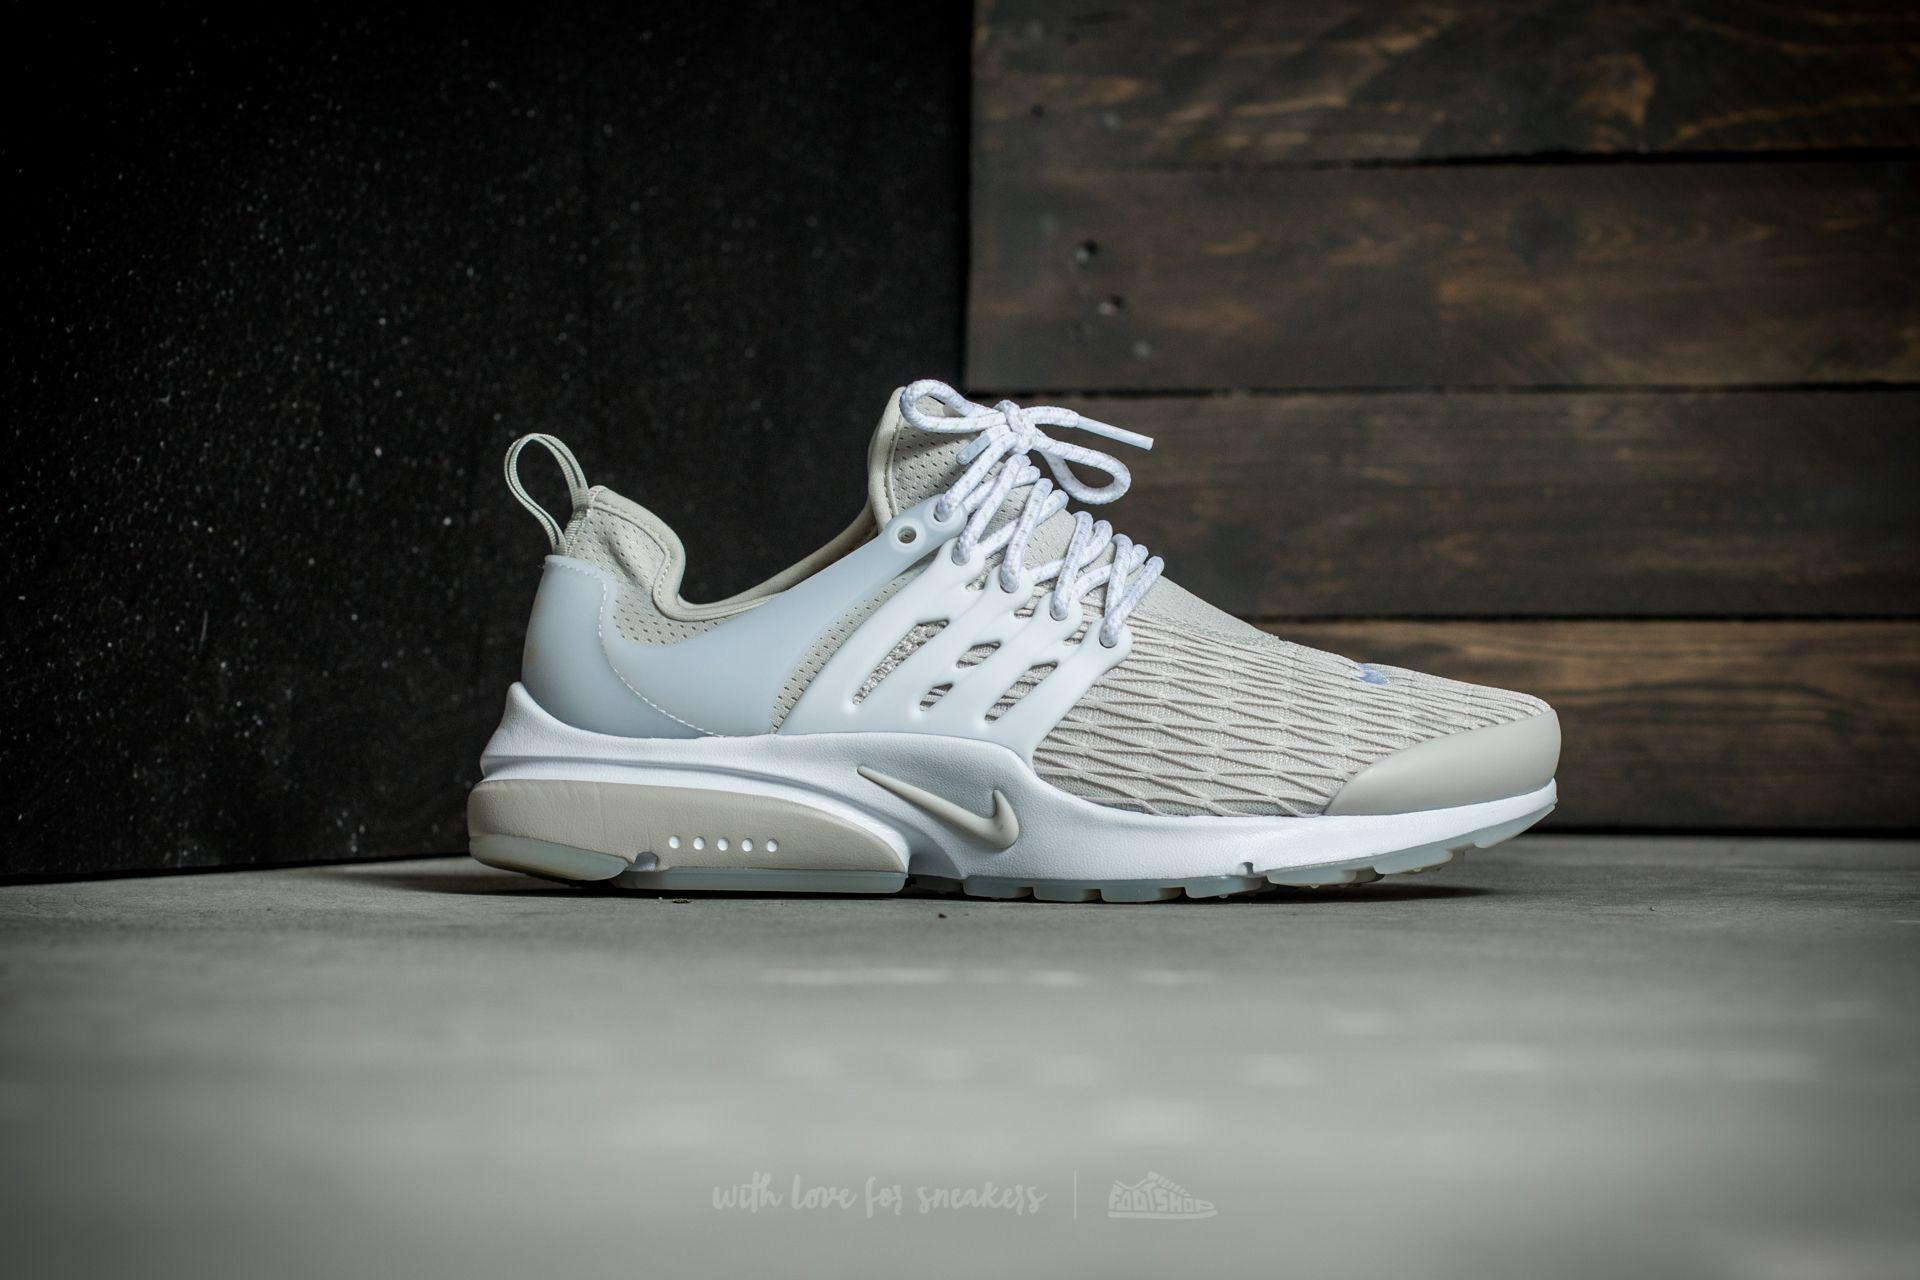 quality design 0d8d9 04be7 Lyst - Nike W Air Presto Premium Light Bone Light Bone-white